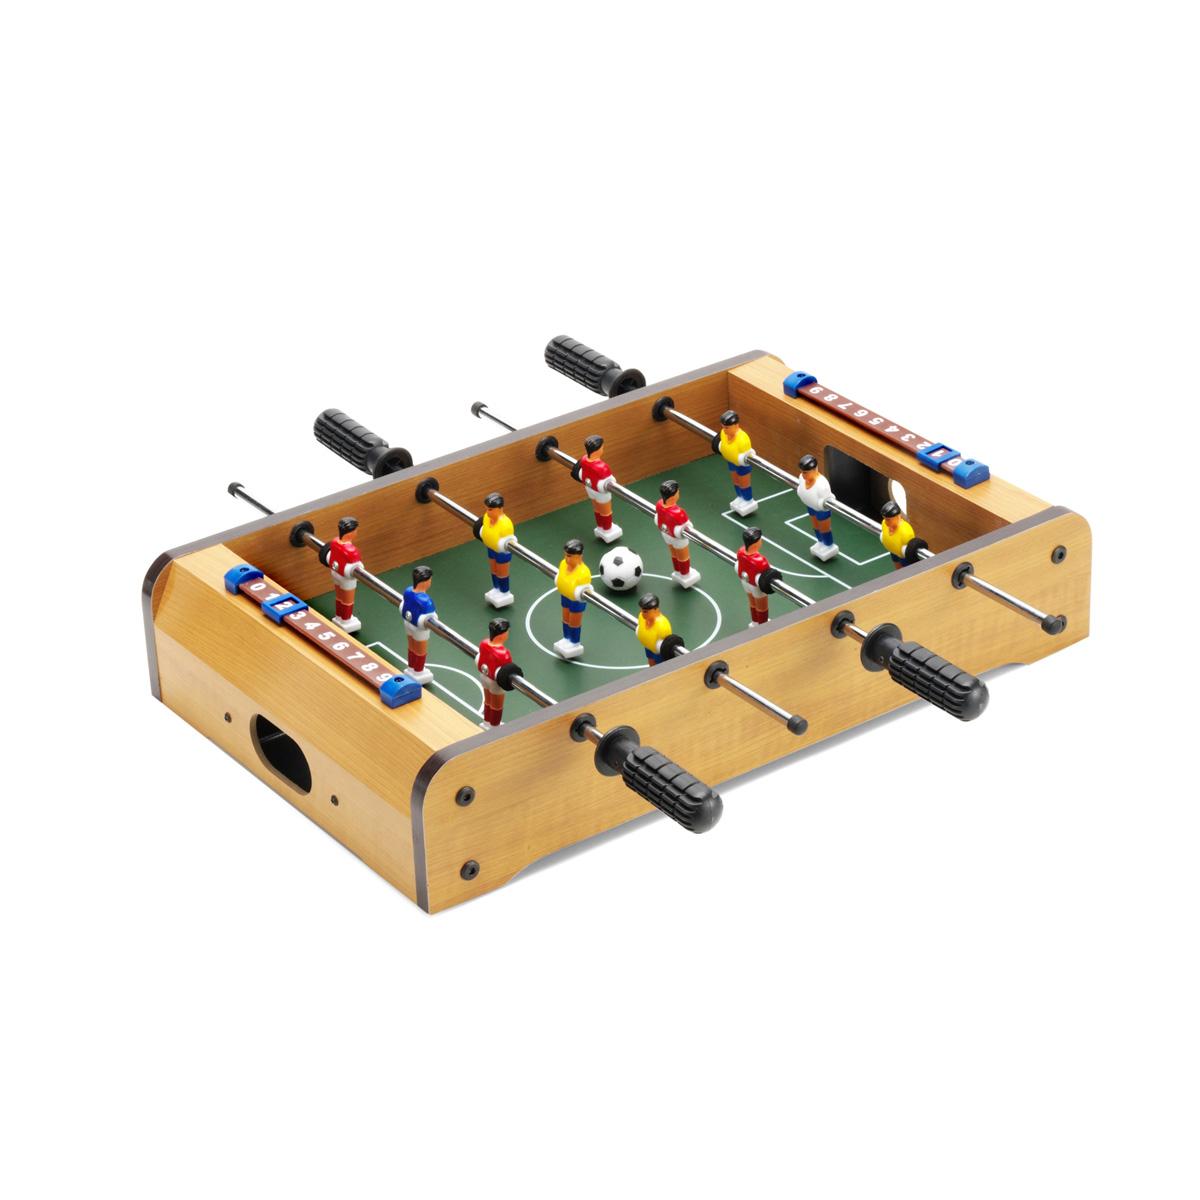 Mini futbol n de madera con 2 pelotas www for Futbolin madera bar